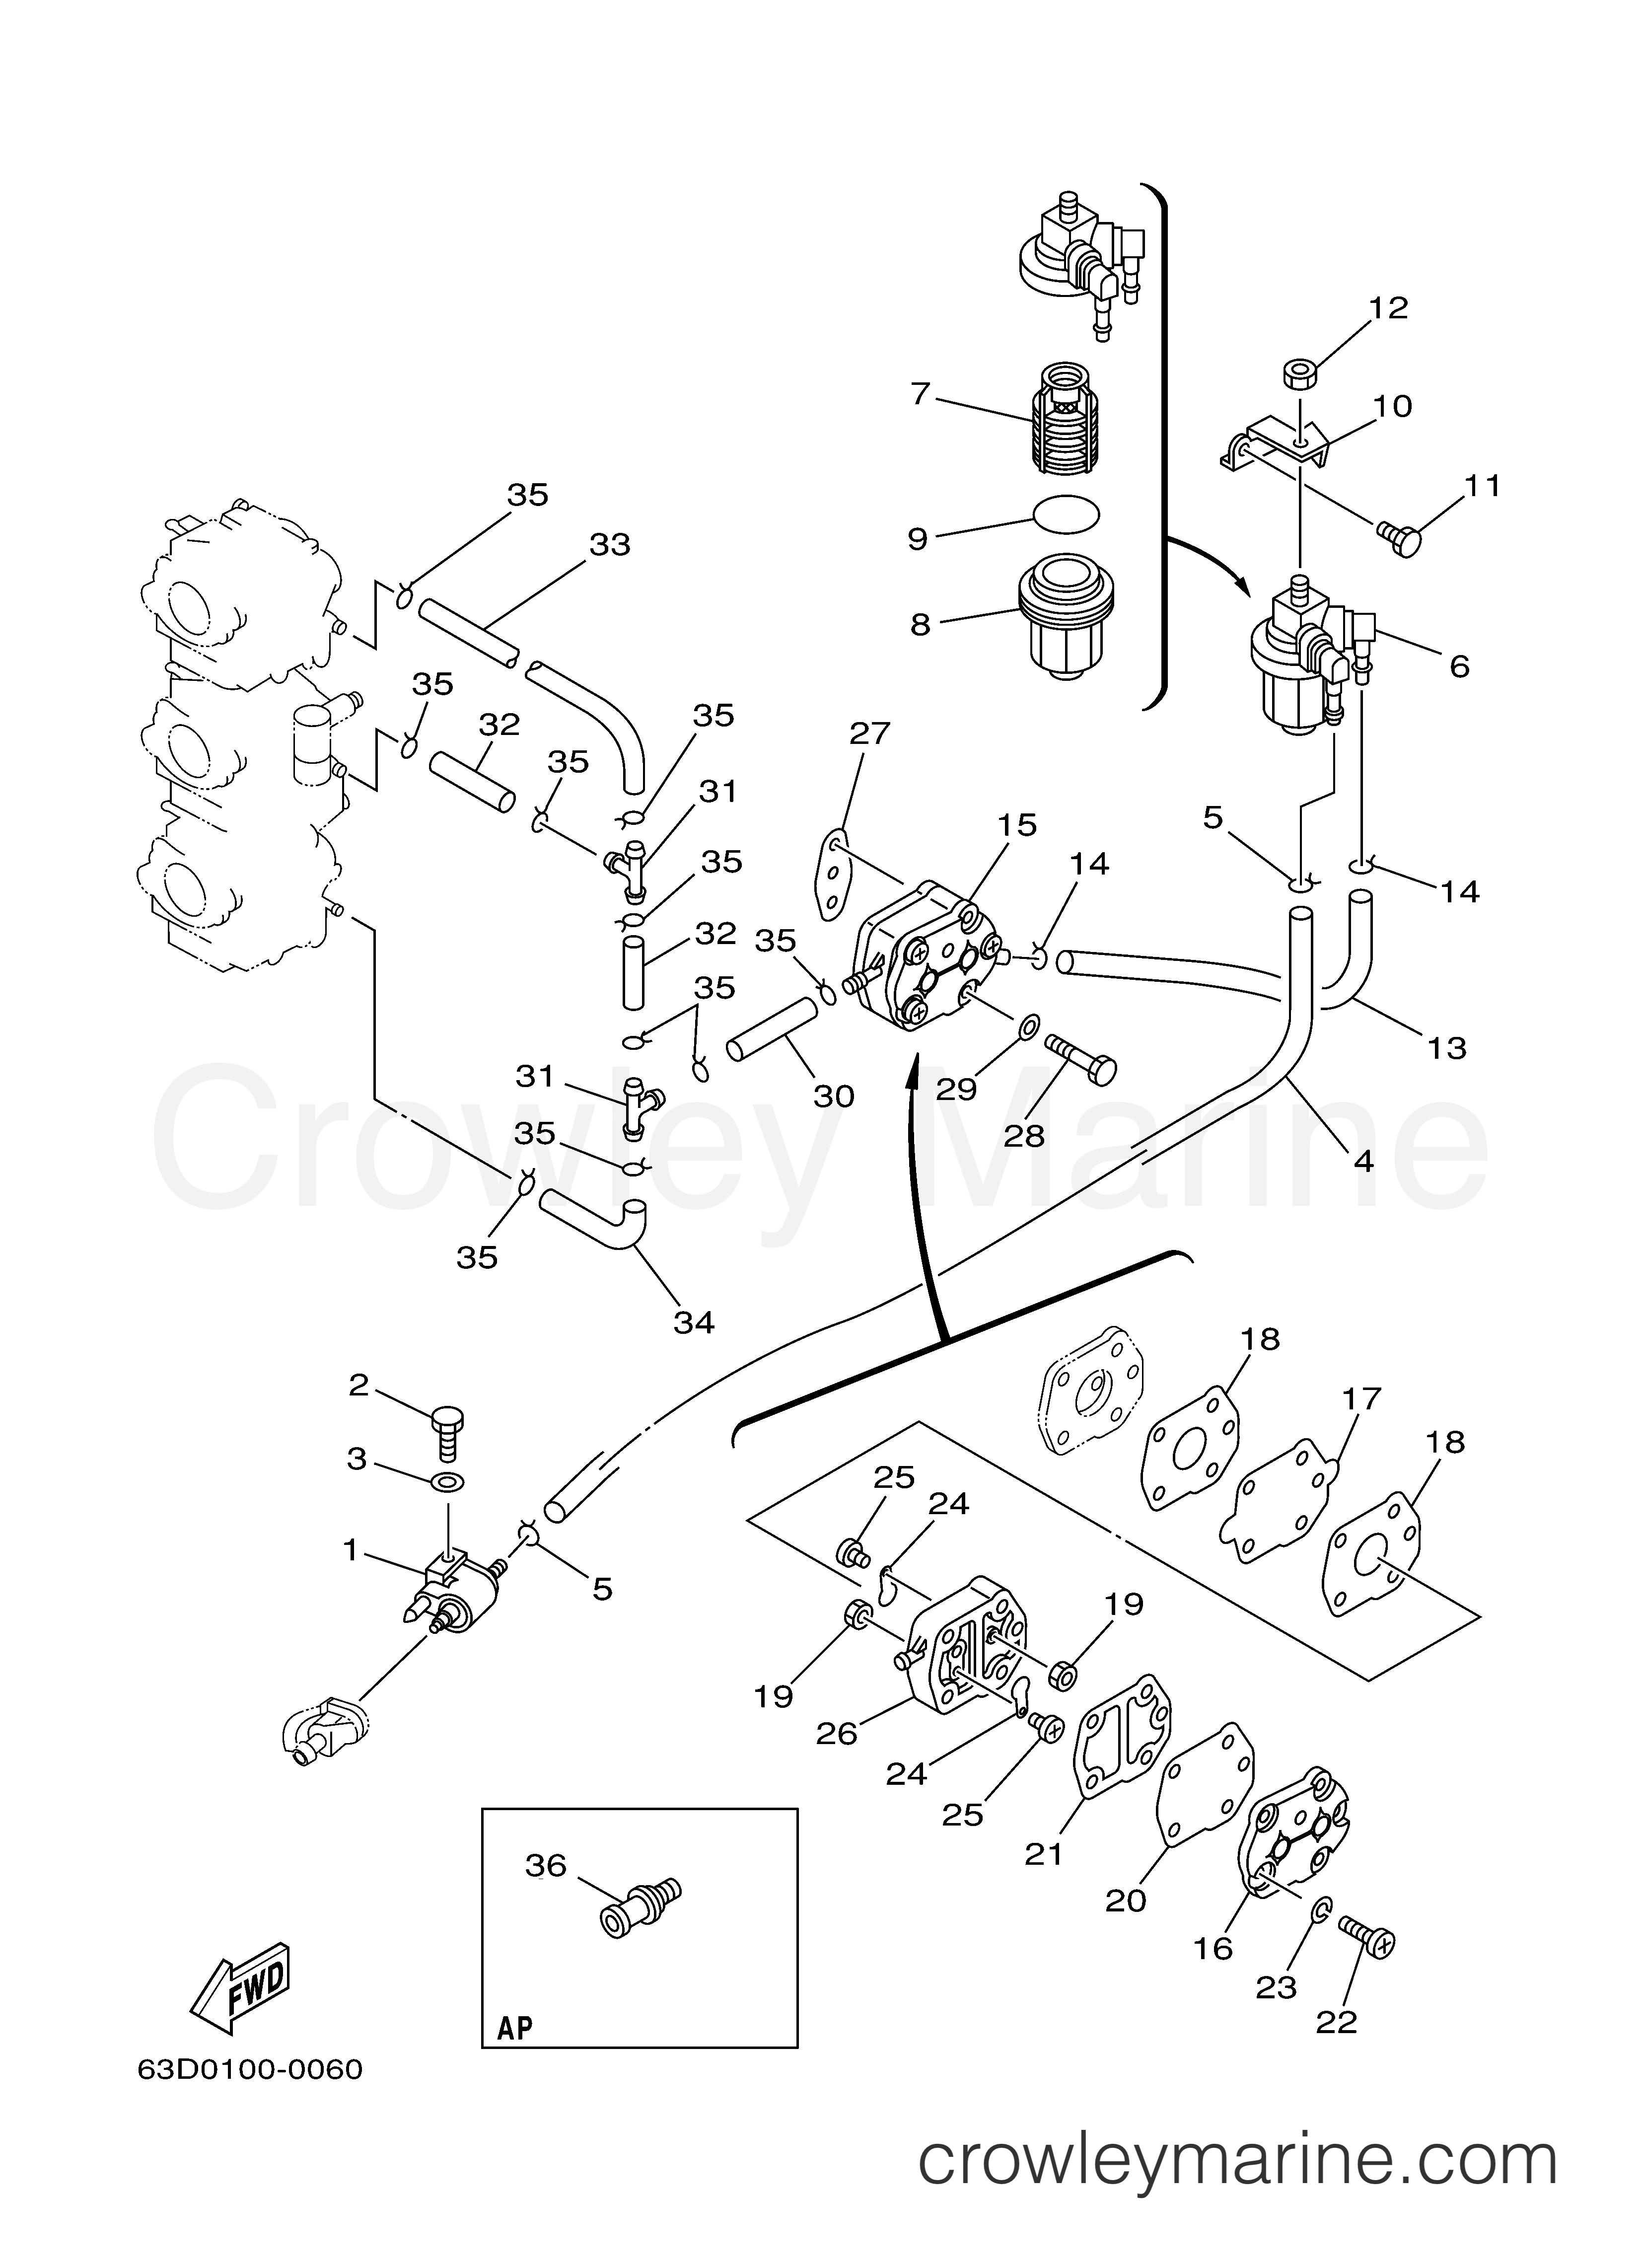 FUEL - 2001 Yamaha Outboard 40hp C40TLRZ | Crowley Marine Marine Hp Wiring Diagrams on hp power supply diagram, hp cable diagram, hp parts diagram, hp computer diagram, hp networking diagram, hp piping diagram, hp panel diagram, hp battery diagram, hp hardware diagram,